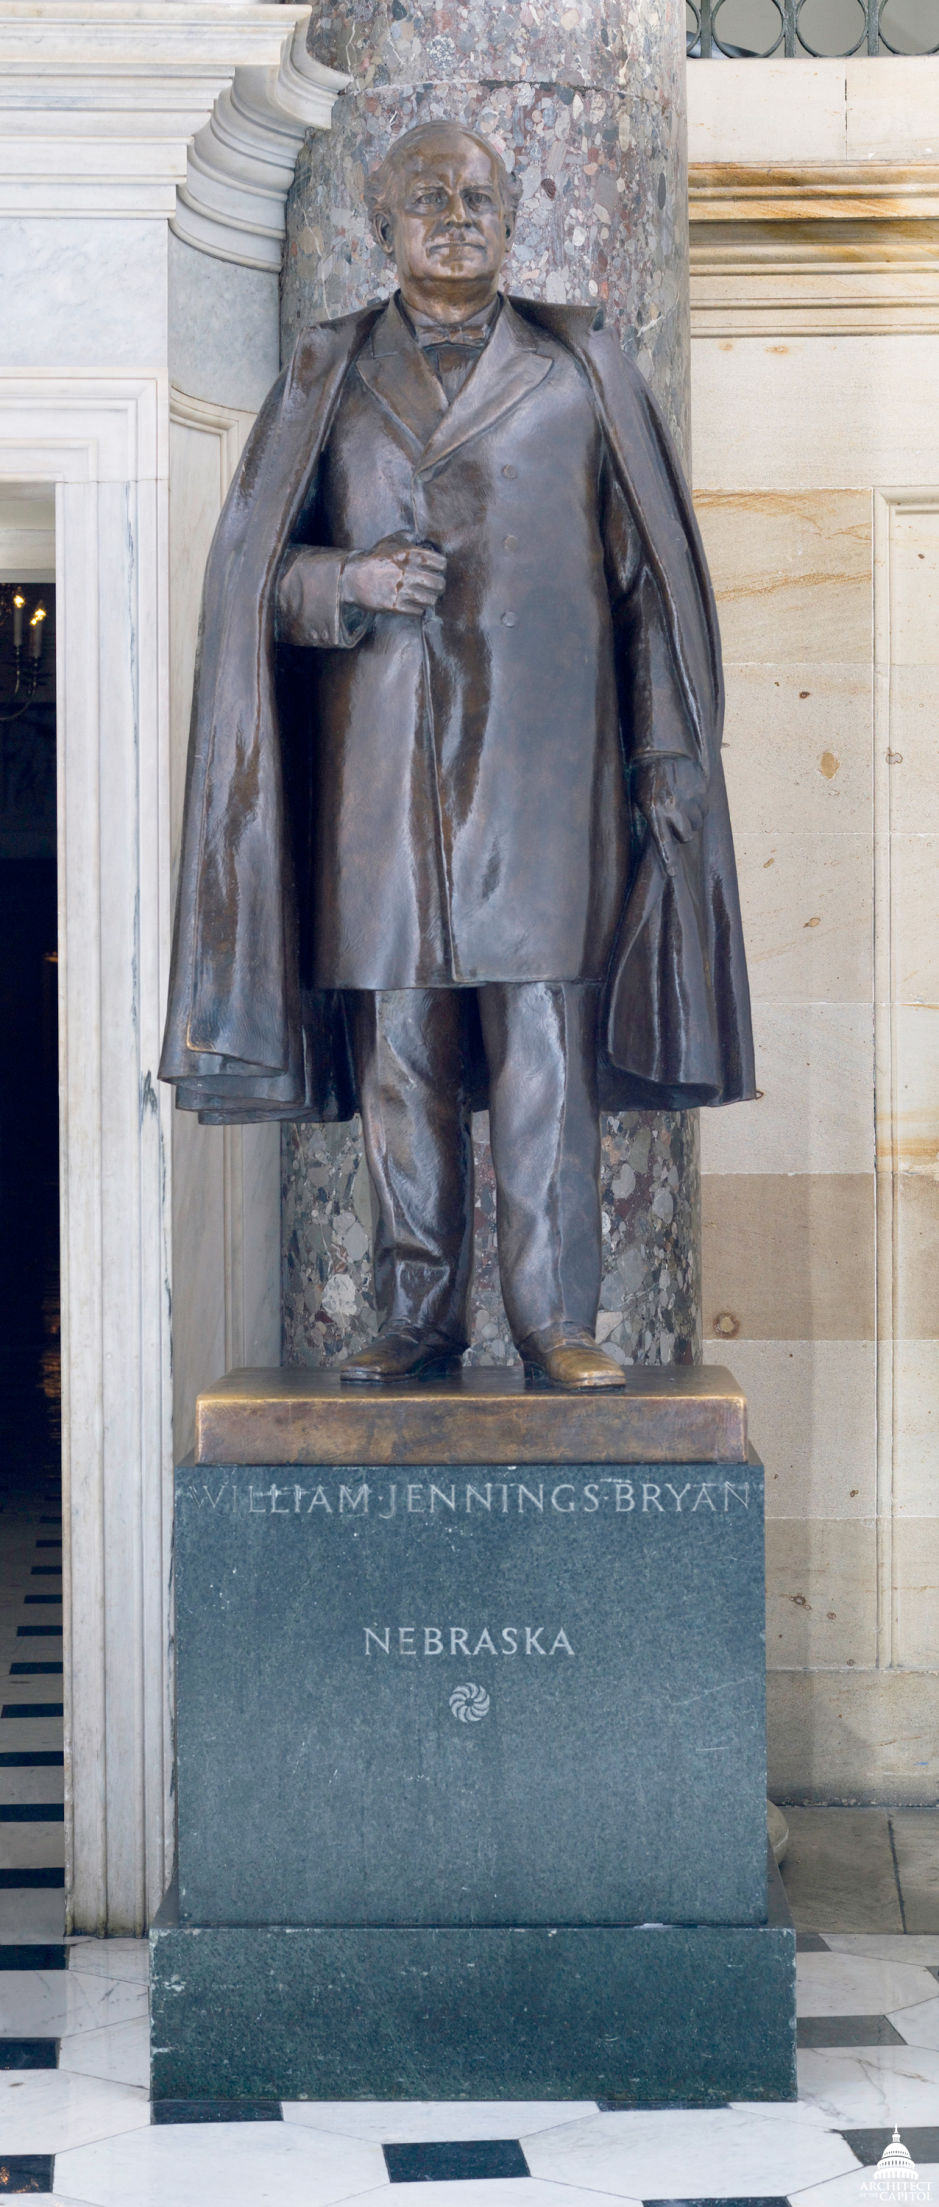 William Jennings Bryan statue